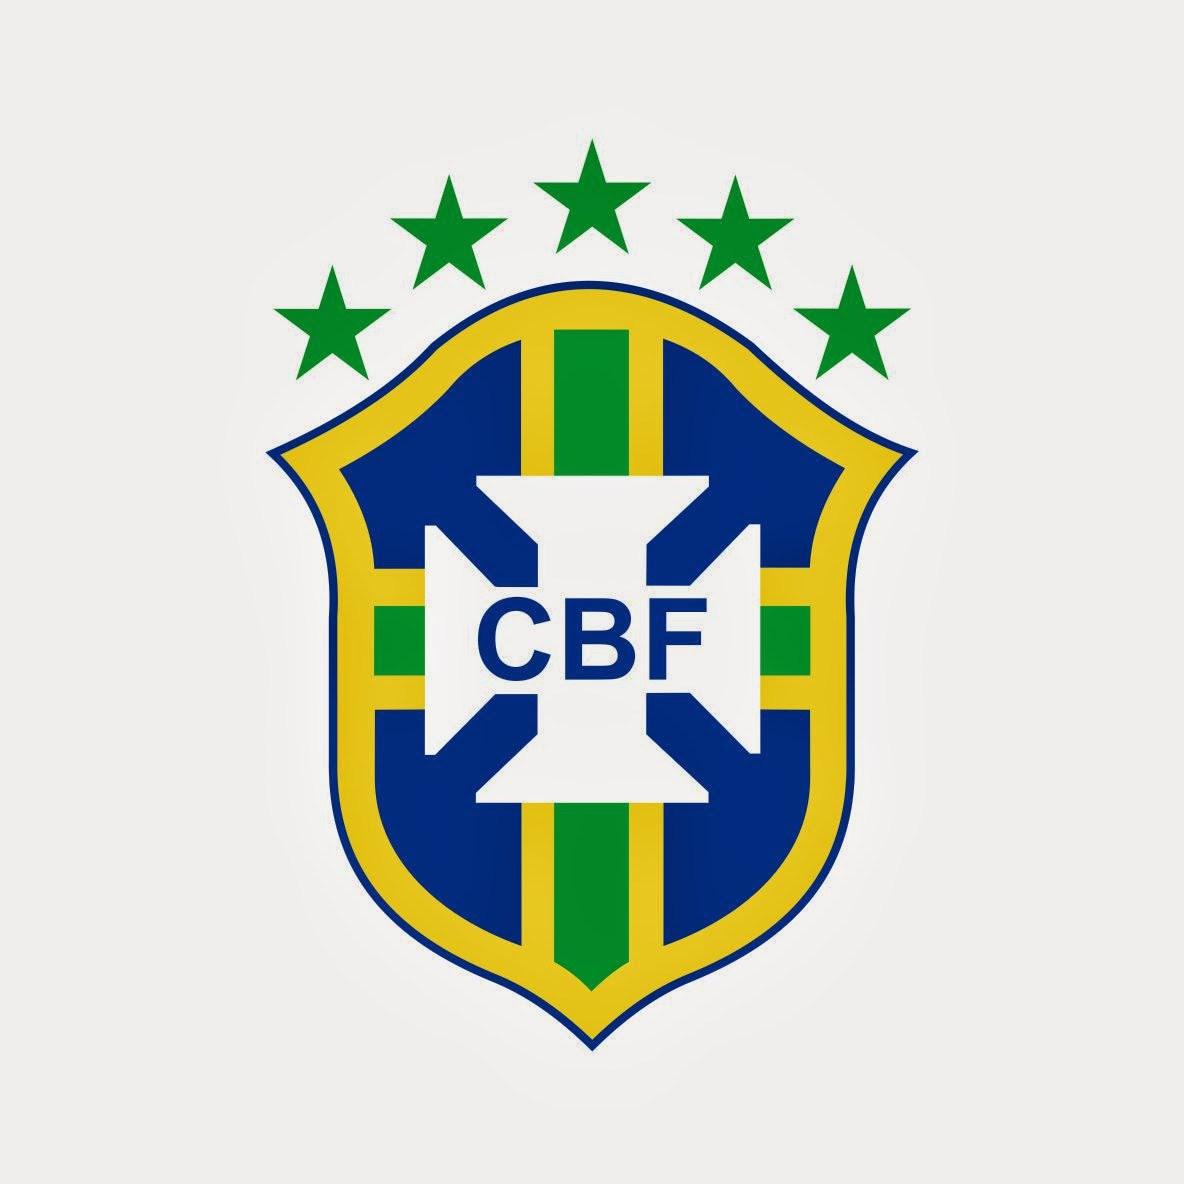 Brazil Football Club Emblem Wallpaper